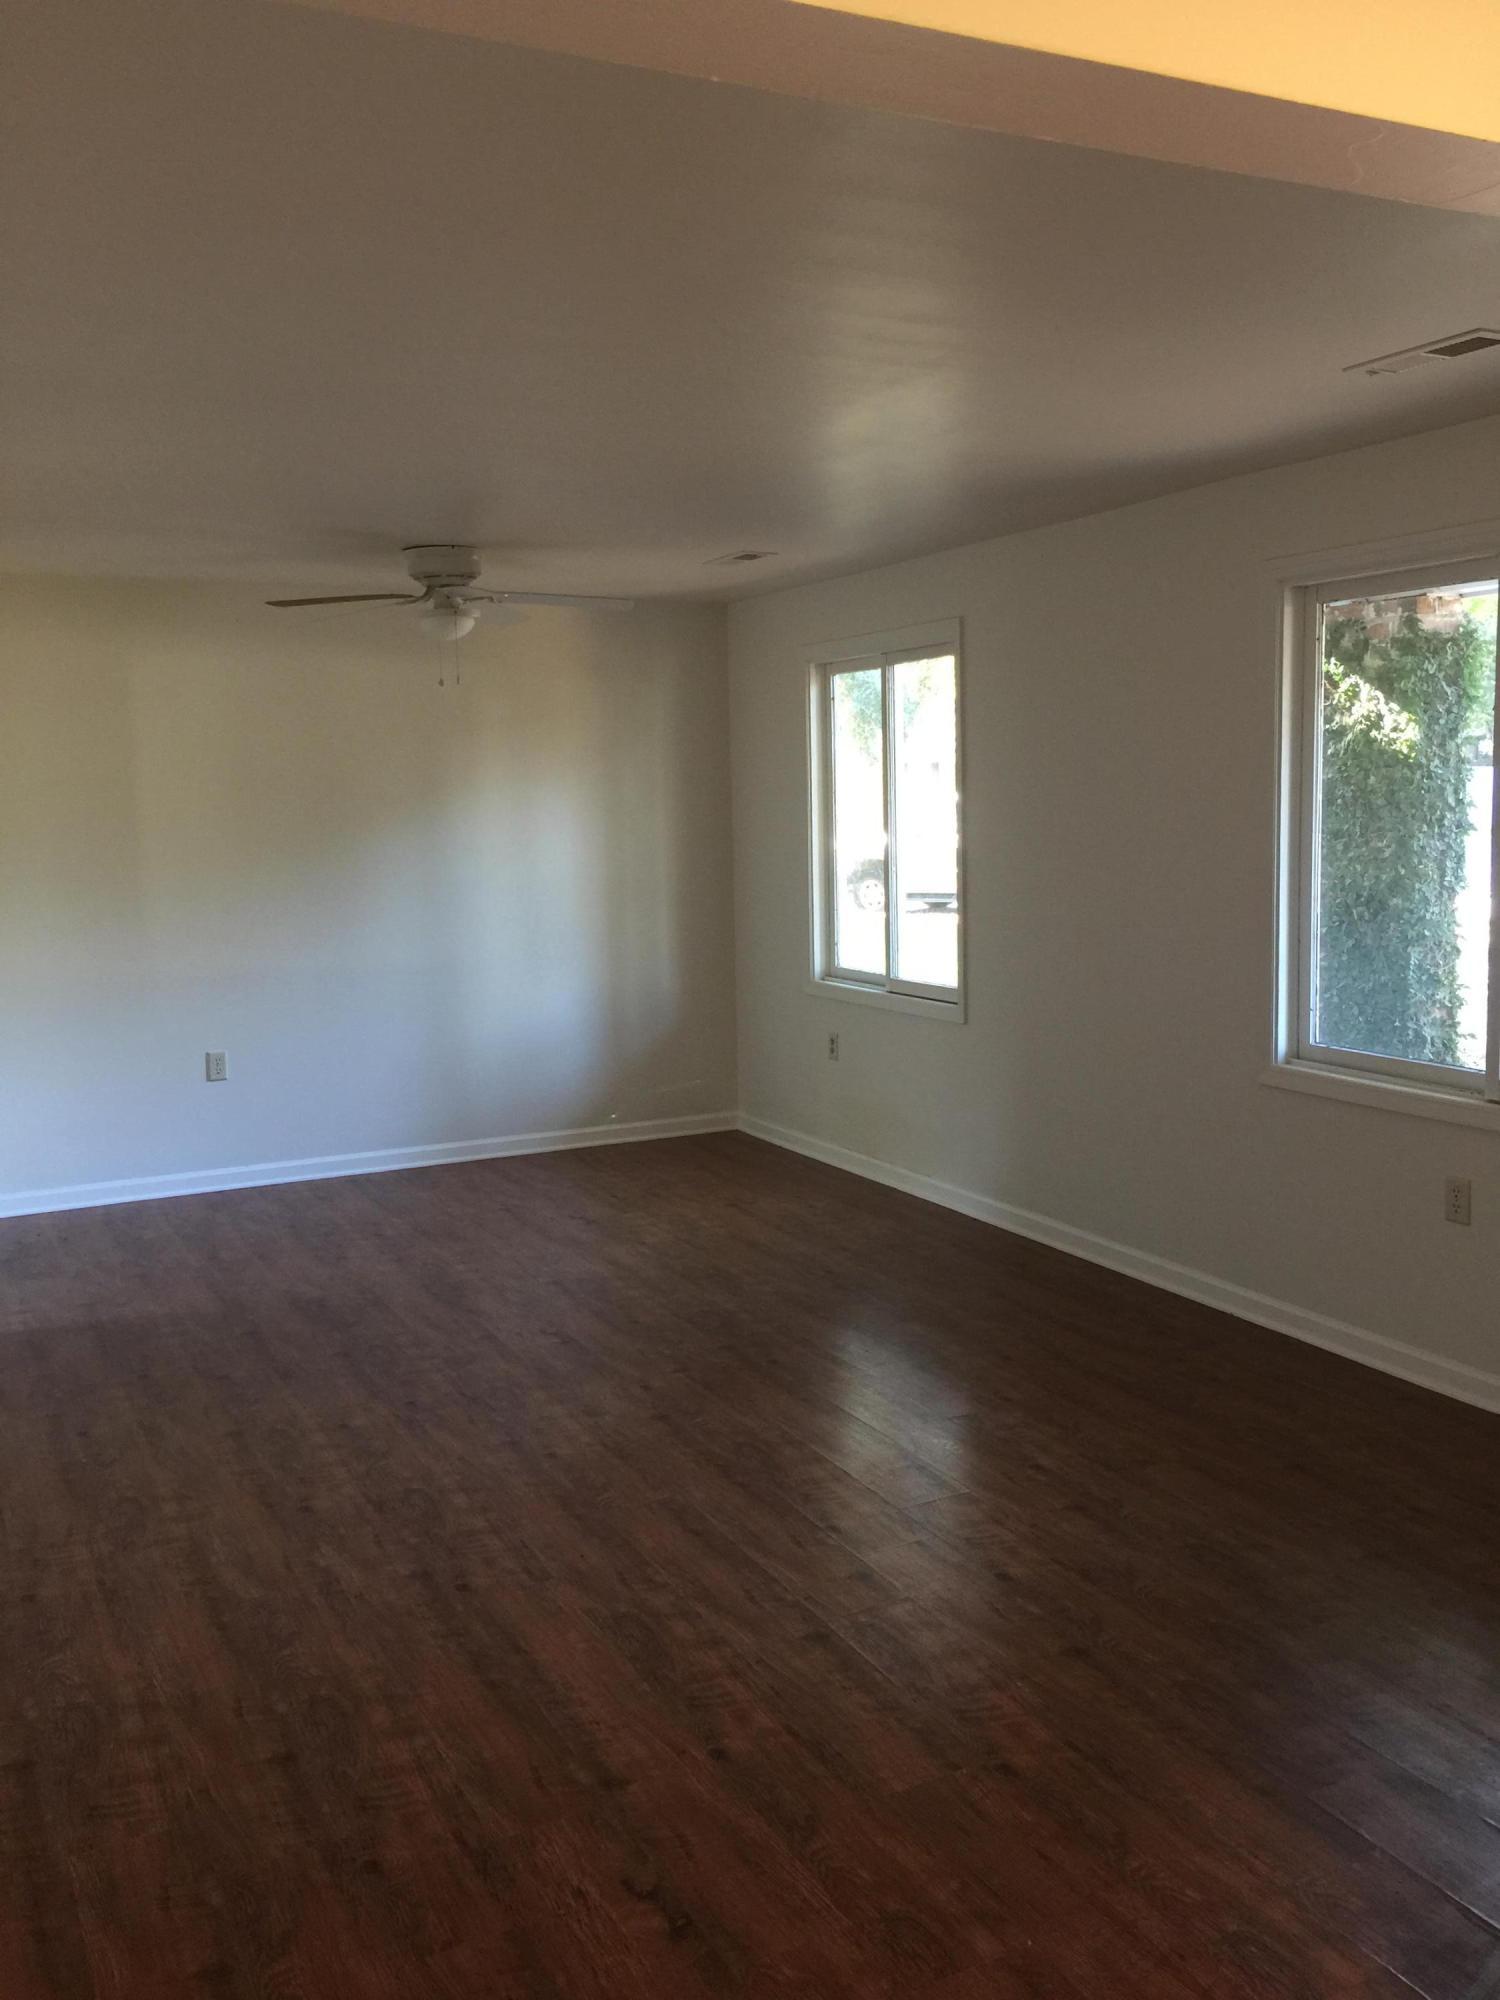 Quail Run Homes For Sale - 1202 Chicorie, Charleston, SC - 3